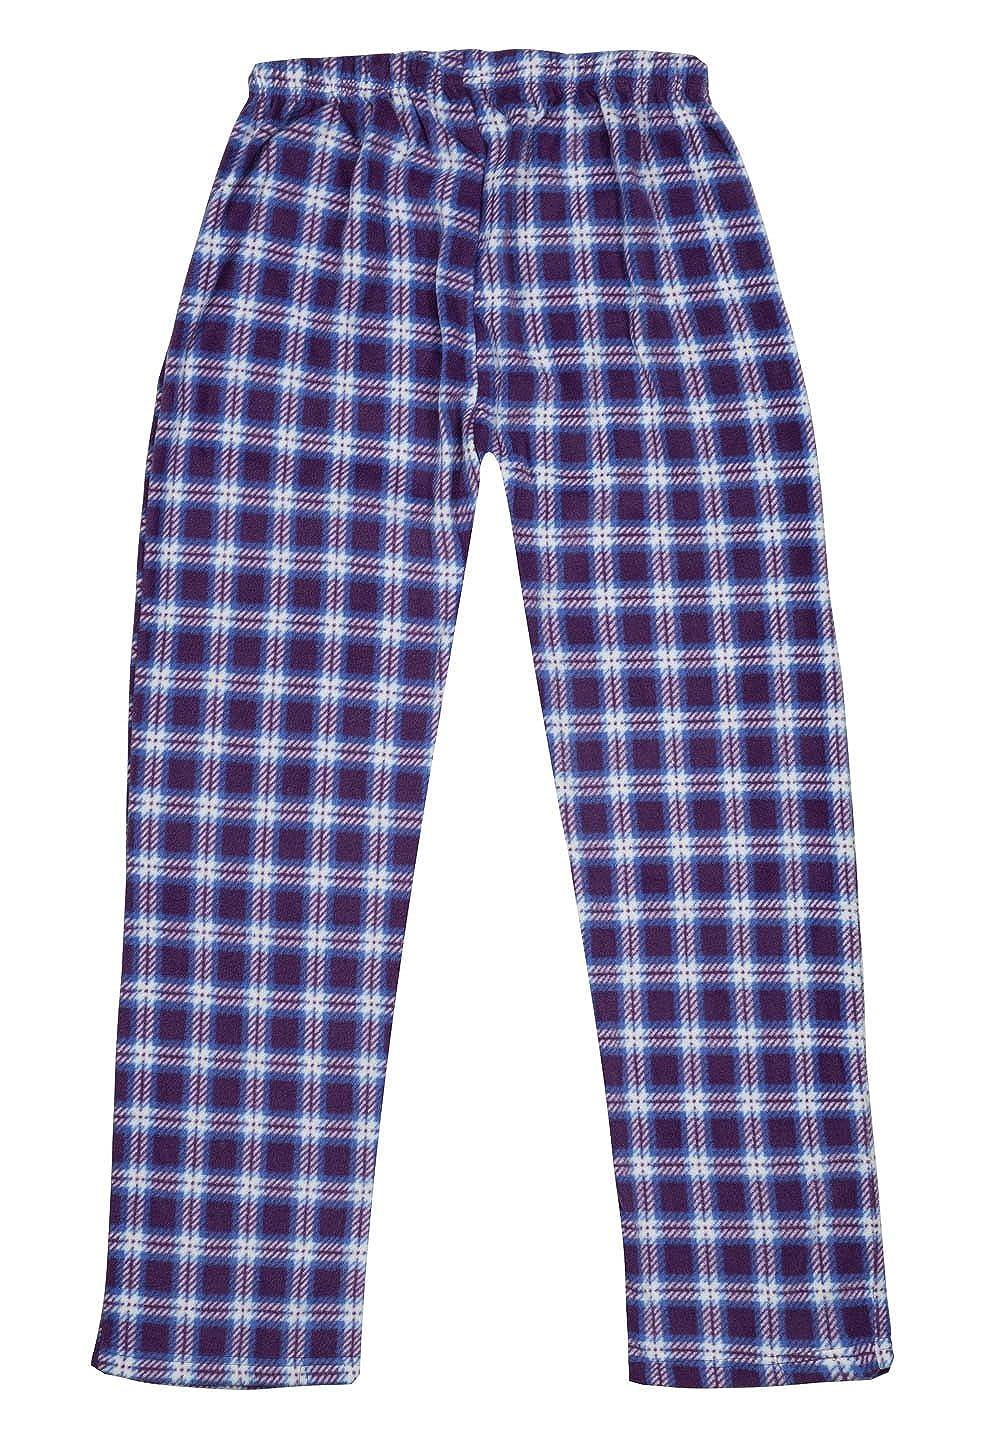 North 15 Girls Super Cozy Fleece Pajama Bottom Lounge Pants 7-14